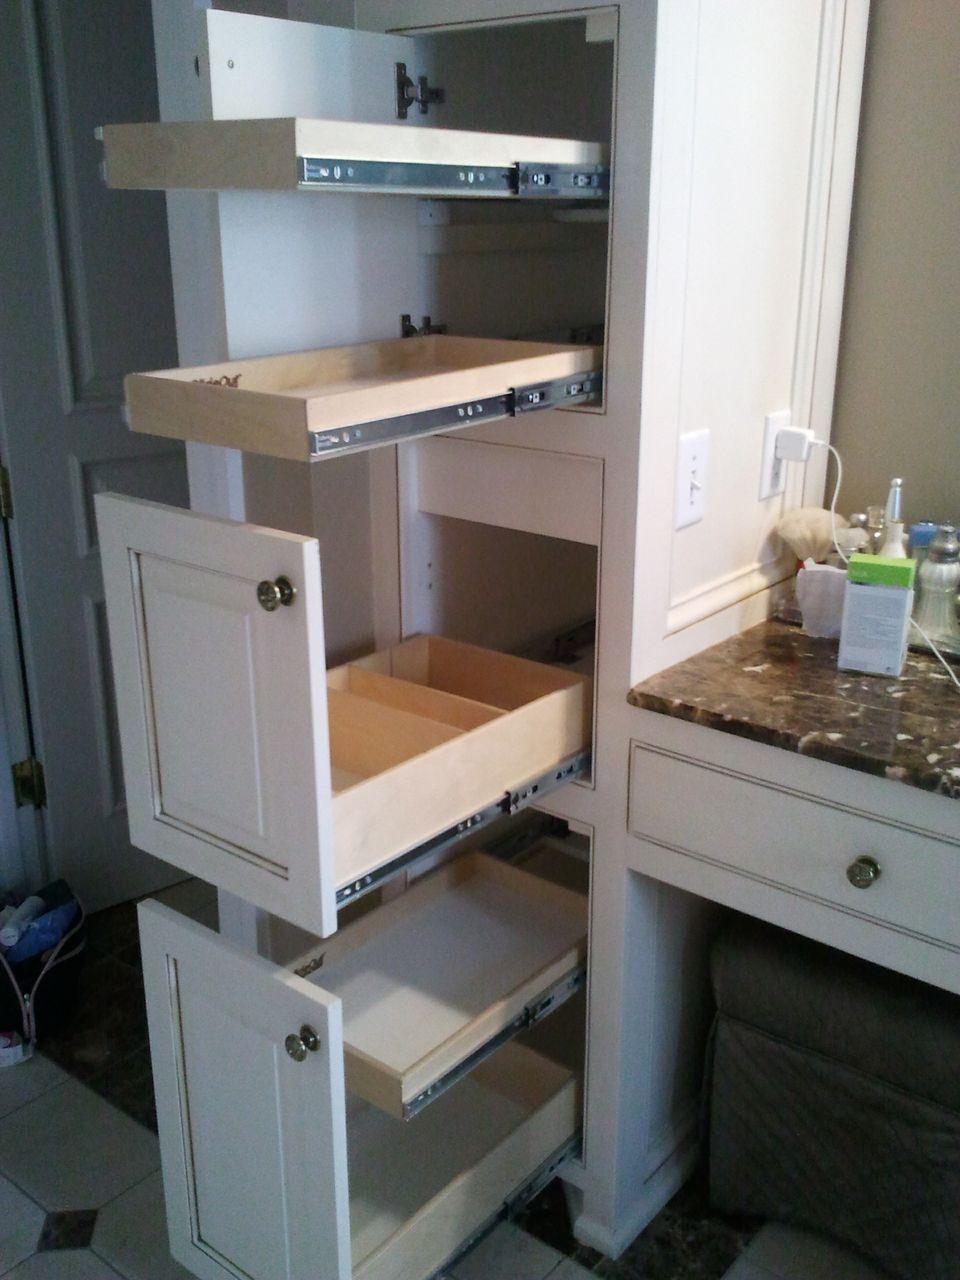 Create Custom Bathroomstorage With A Little Help From Shelfgenie Pul Built In Bathroom Storage Bathroom Storage Solutions Small Bathroom Storage Cabinet